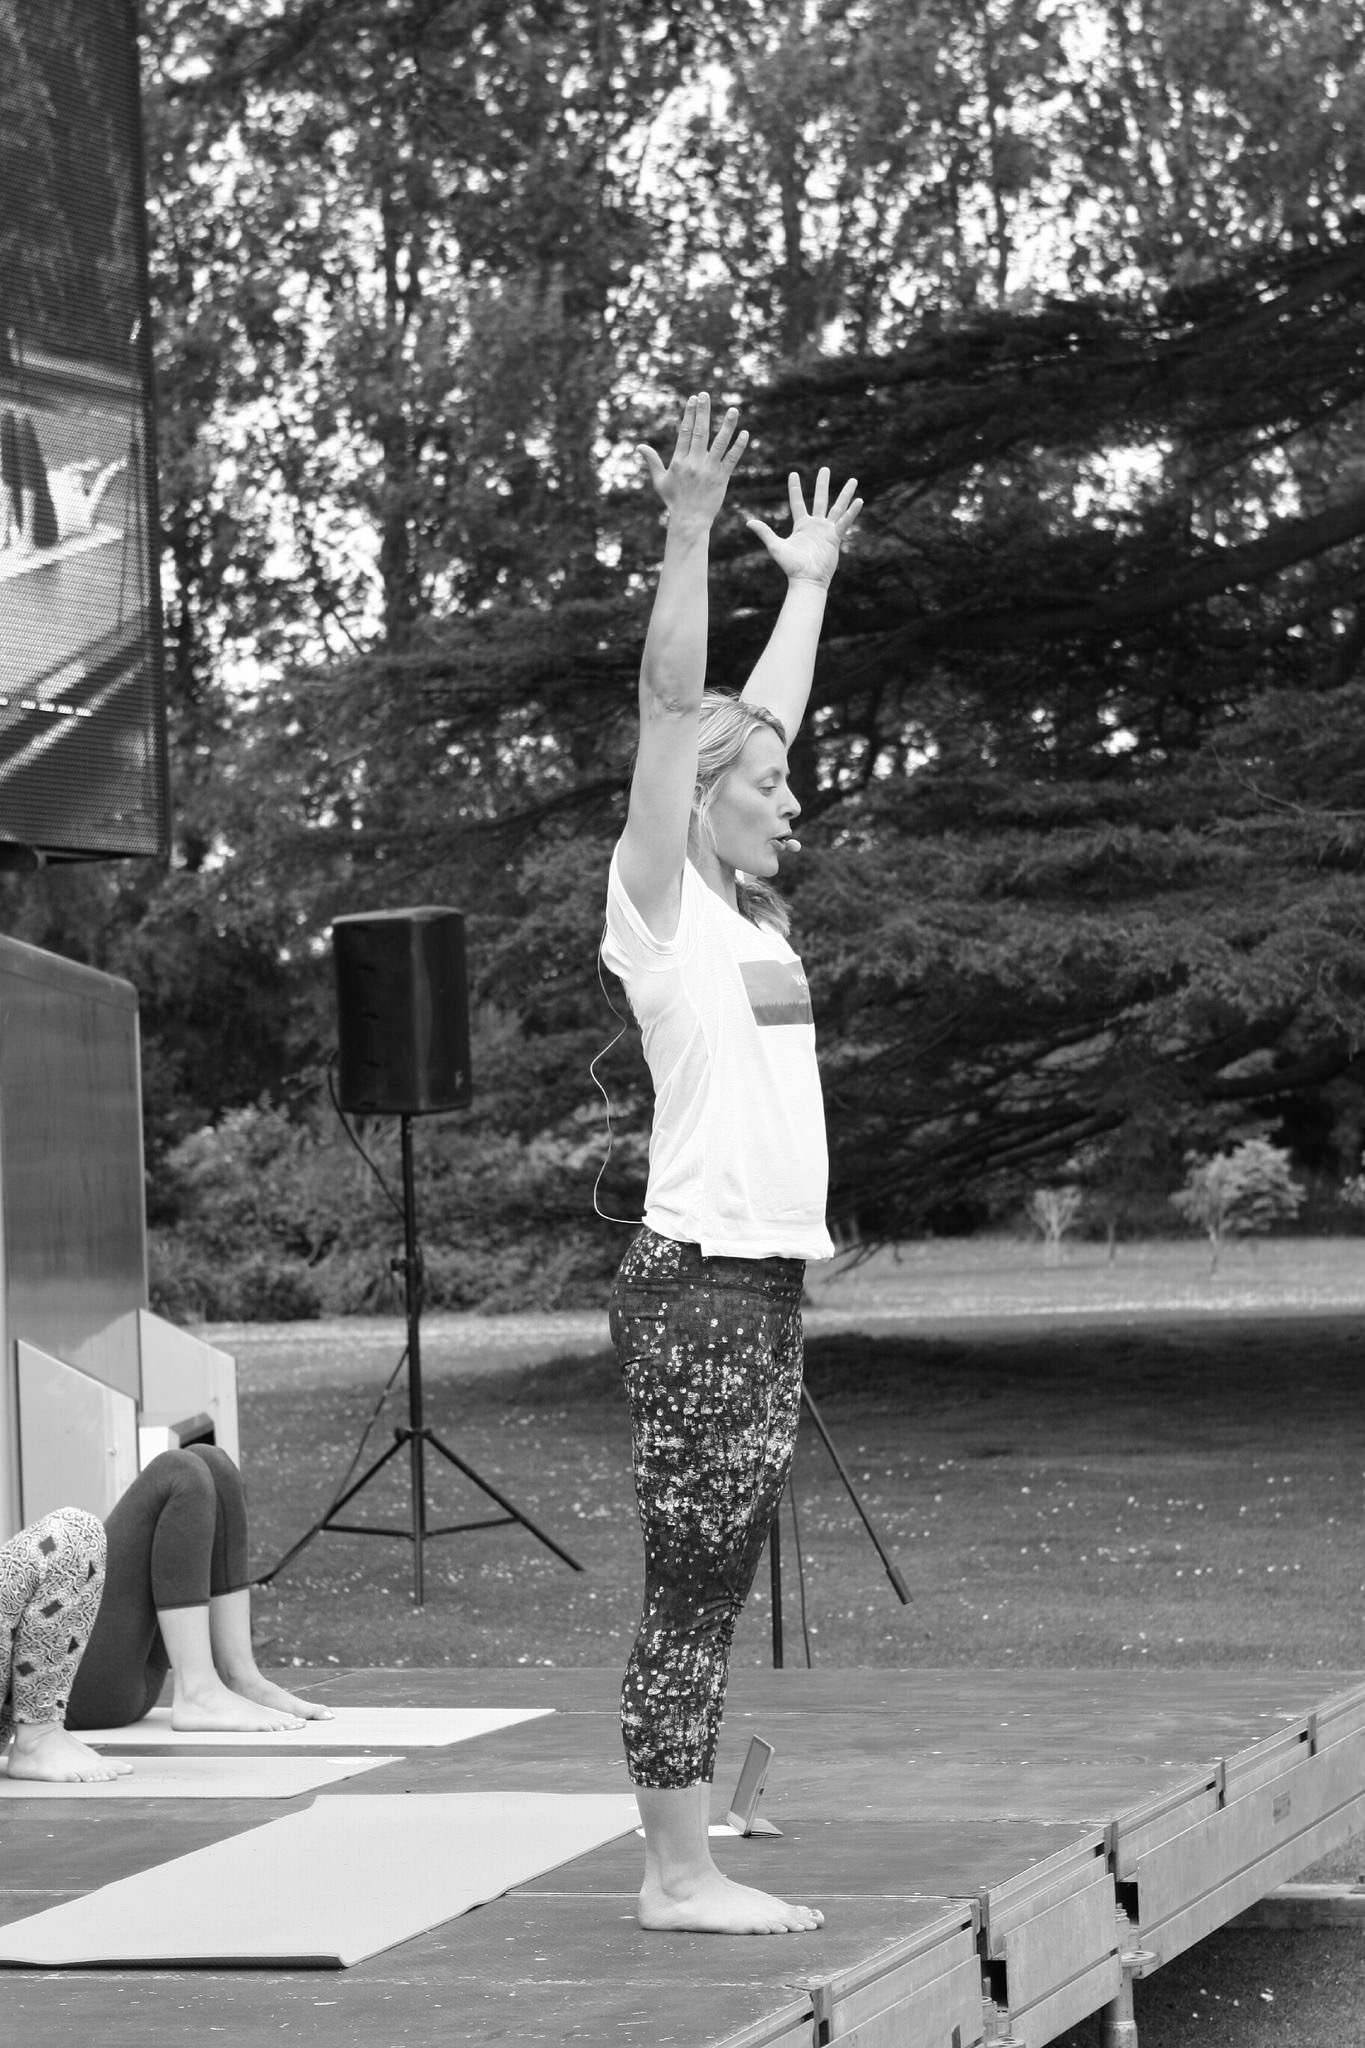 Yoga in the Park, Malahide